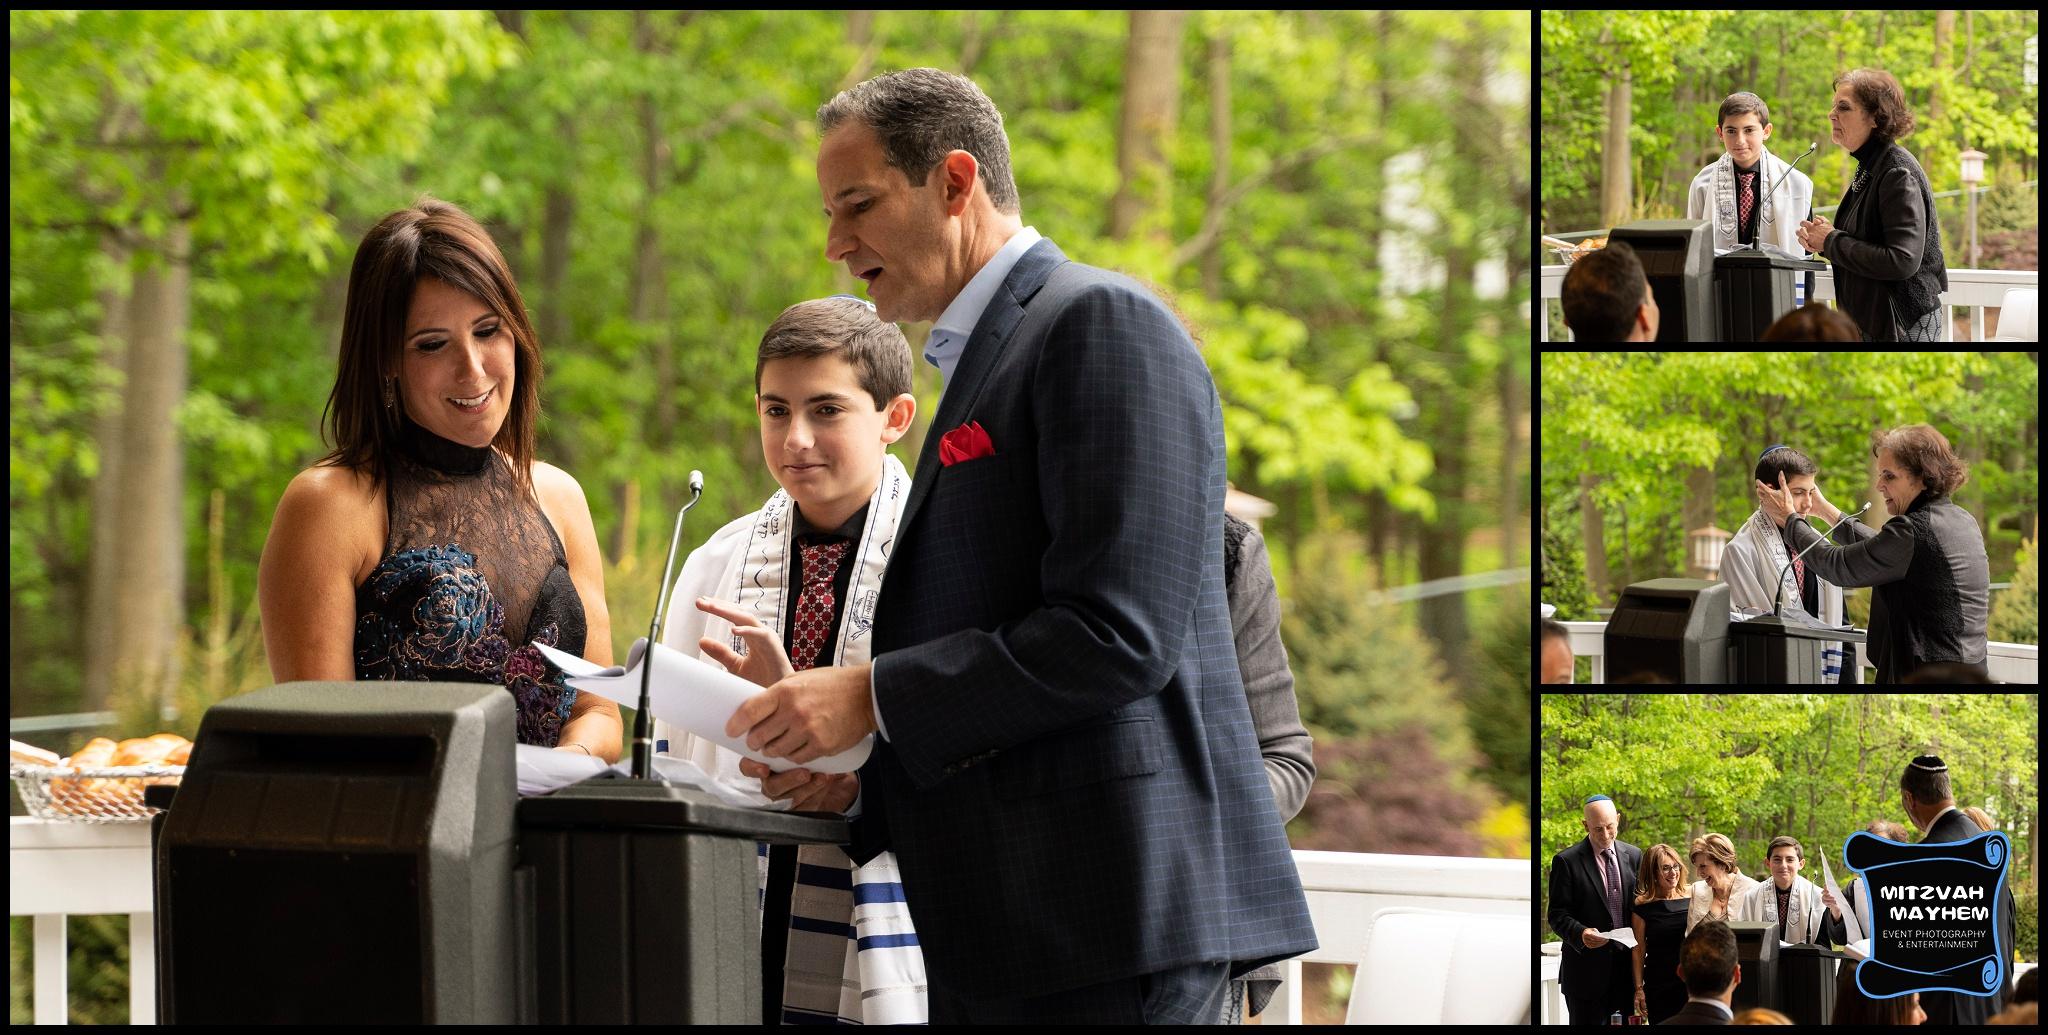 vegas-nj-bar-mitzvah-photography-Jared-125.JPG